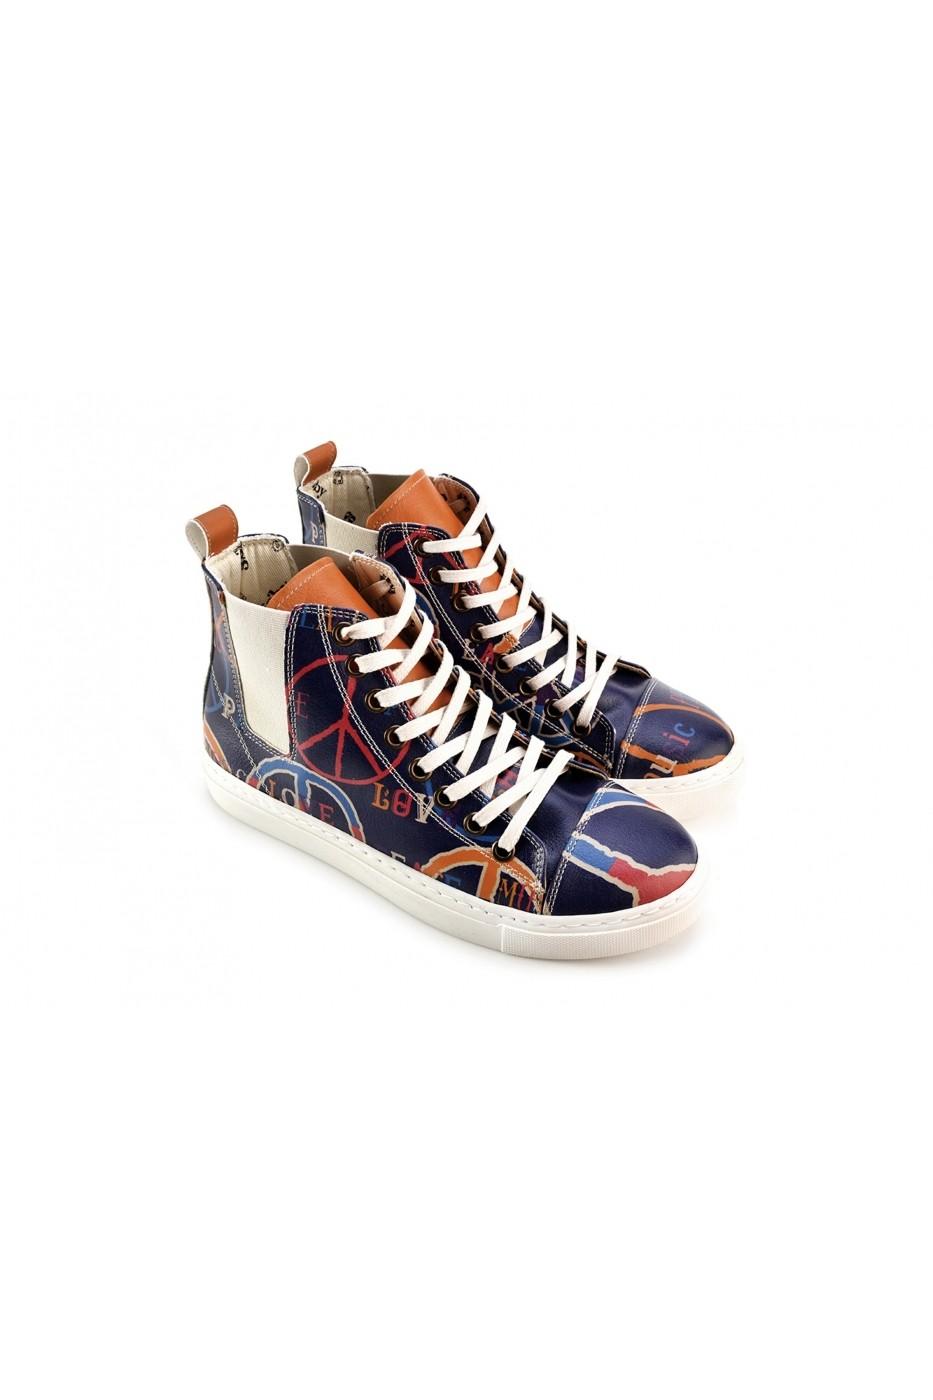 Goby Sneaker cipő FHP-CON112 els Színes - FashionUP! eadba1cdb9